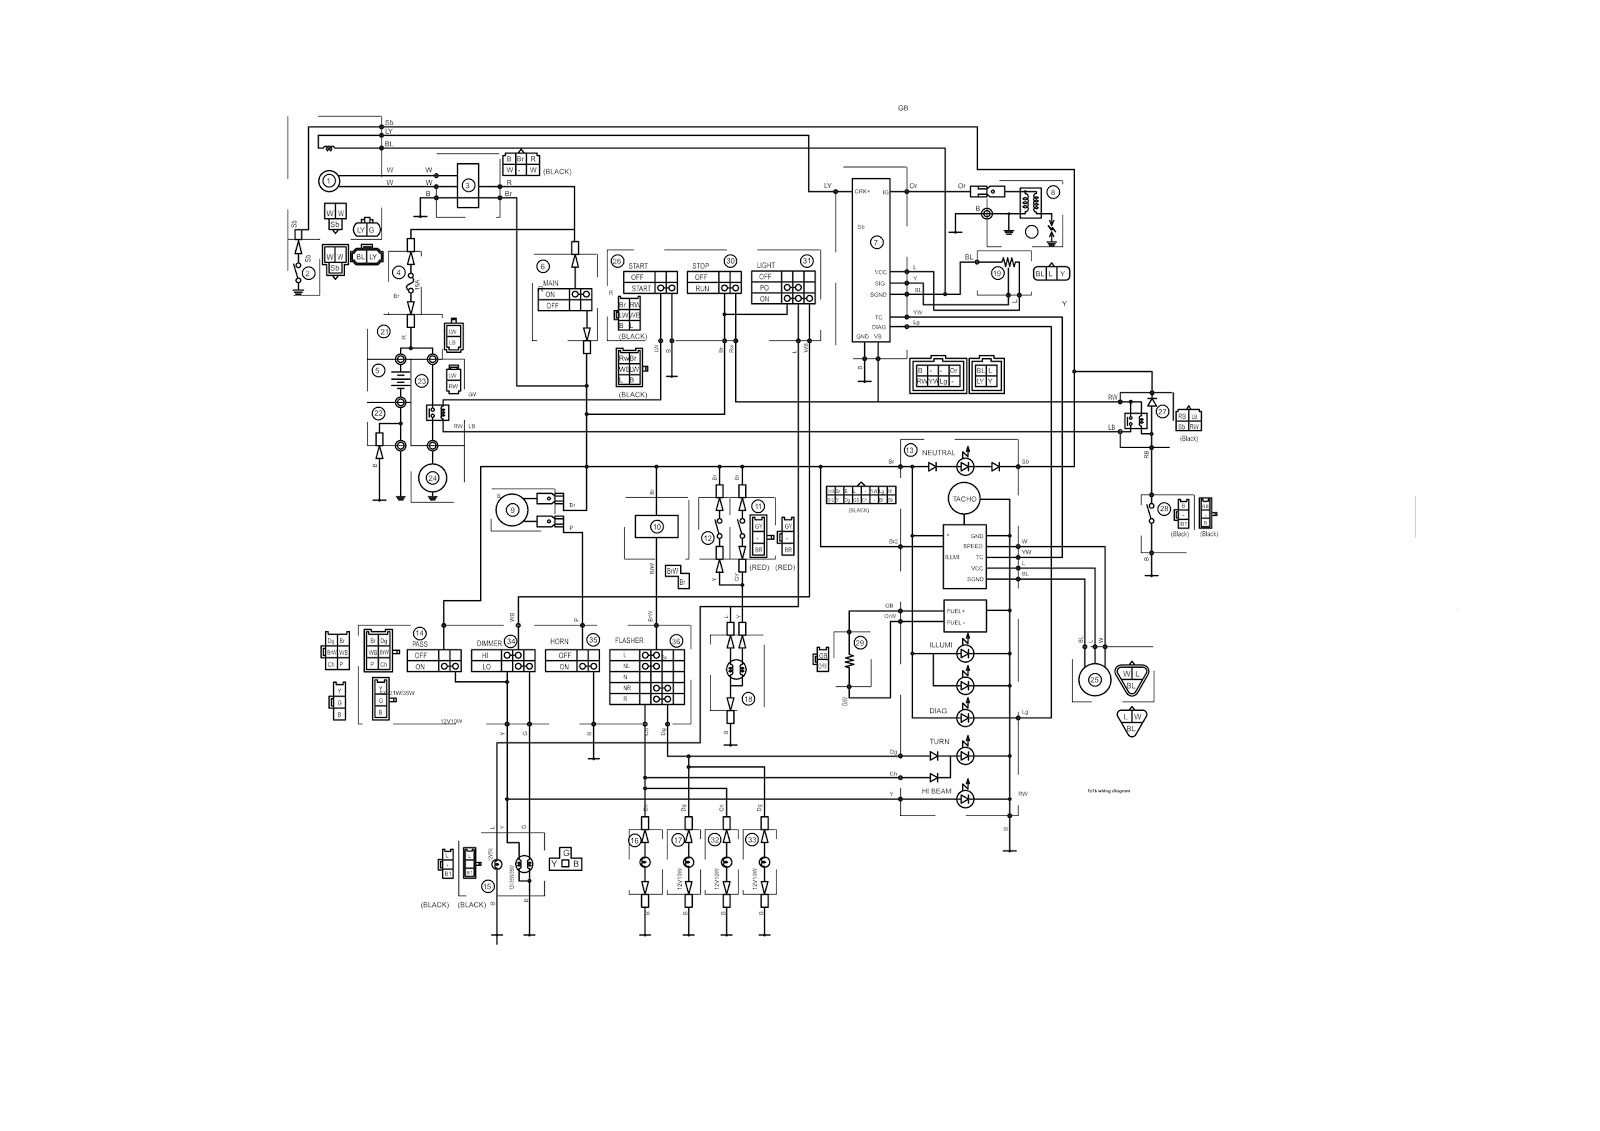 1970 Honda Ct70 Wiring Diagram Schematic Diagrams 1972 Trail 70 For Schematics Atv